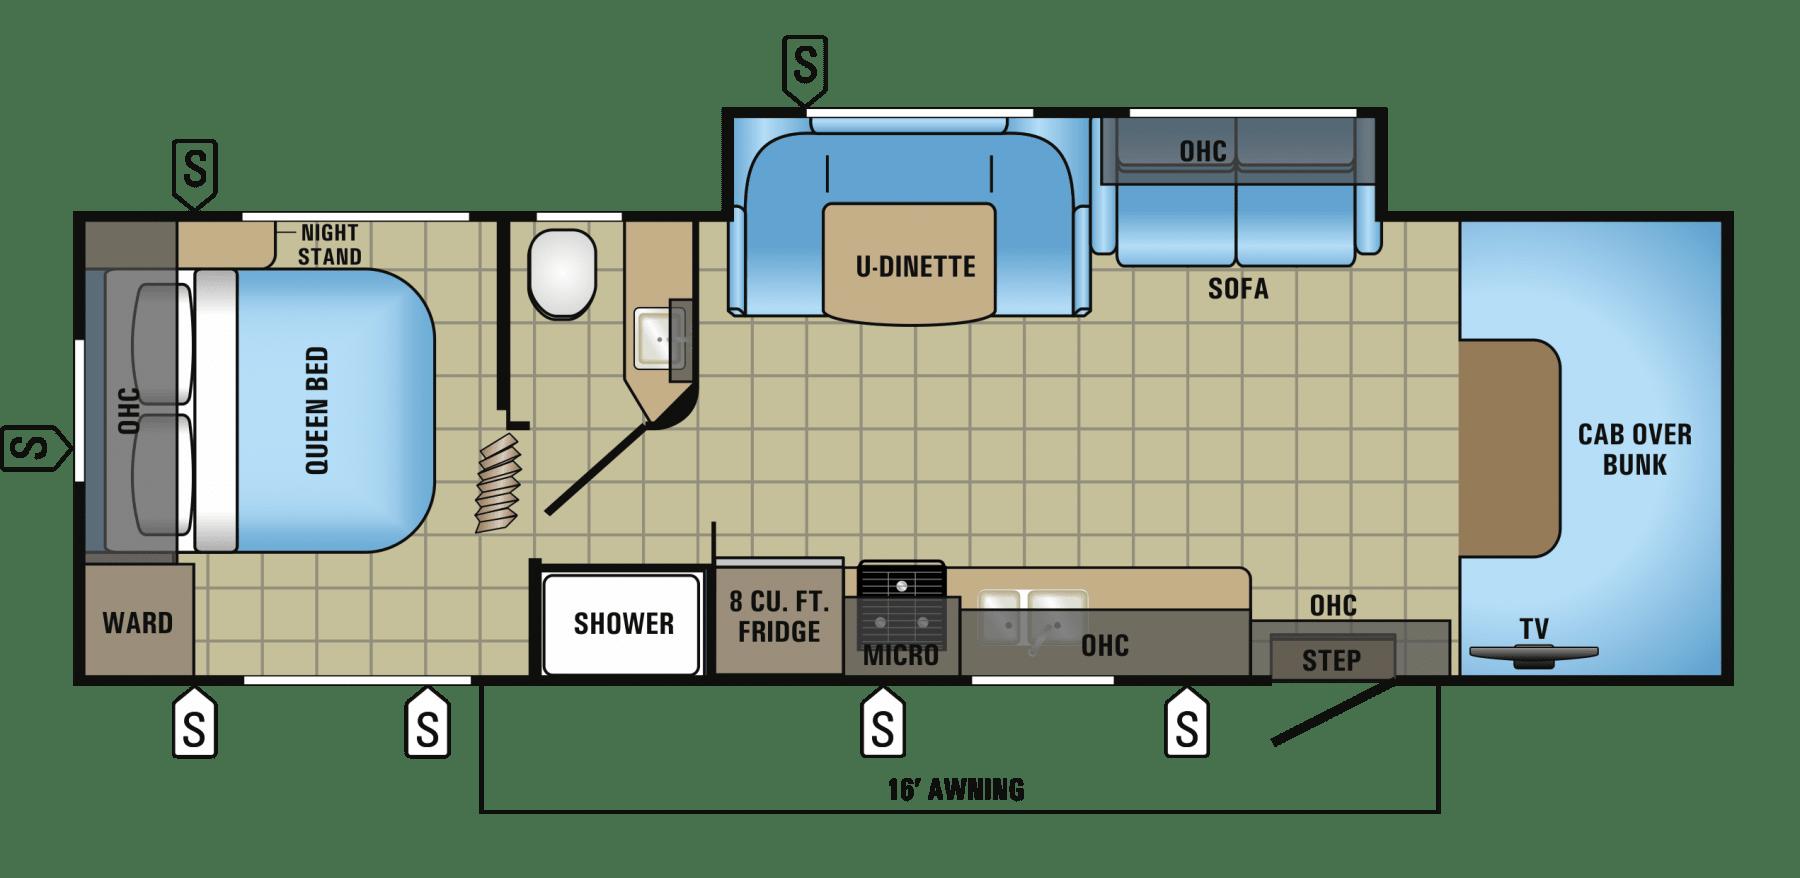 Floor plan layout. Jayco Redhawk 2017